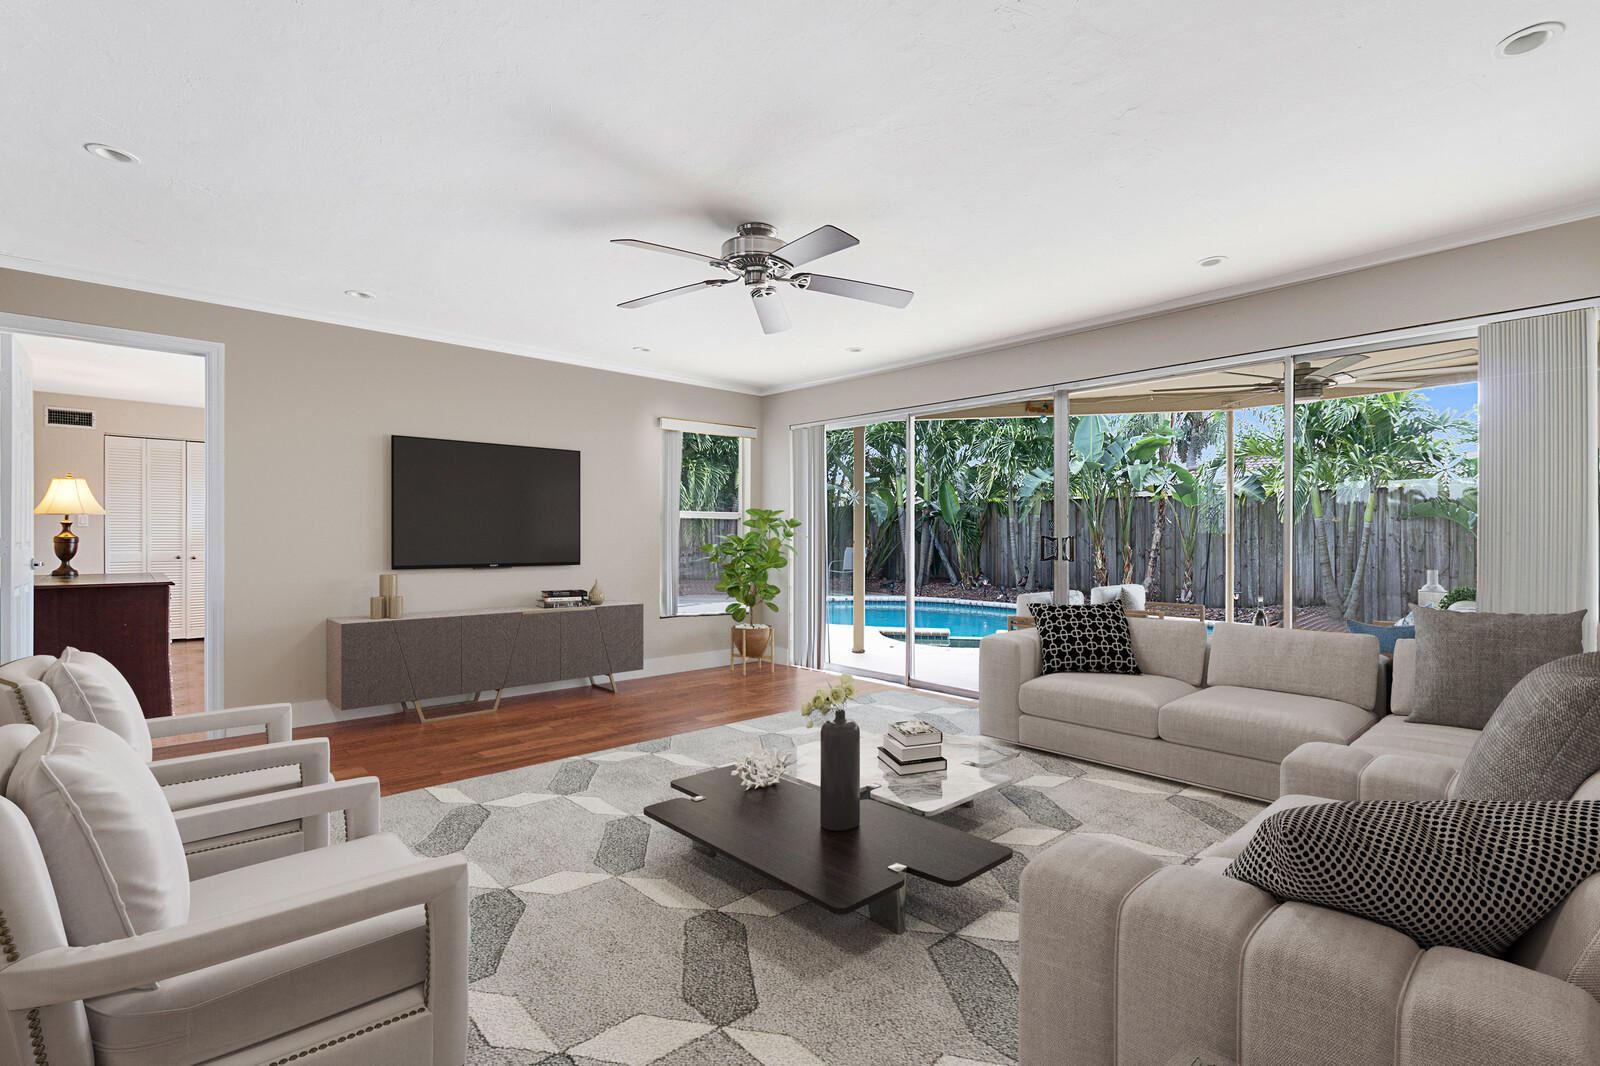 Photo of 2060 NE 63rd Court, Fort Lauderdale, FL 33308 (MLS # RX-10657631)